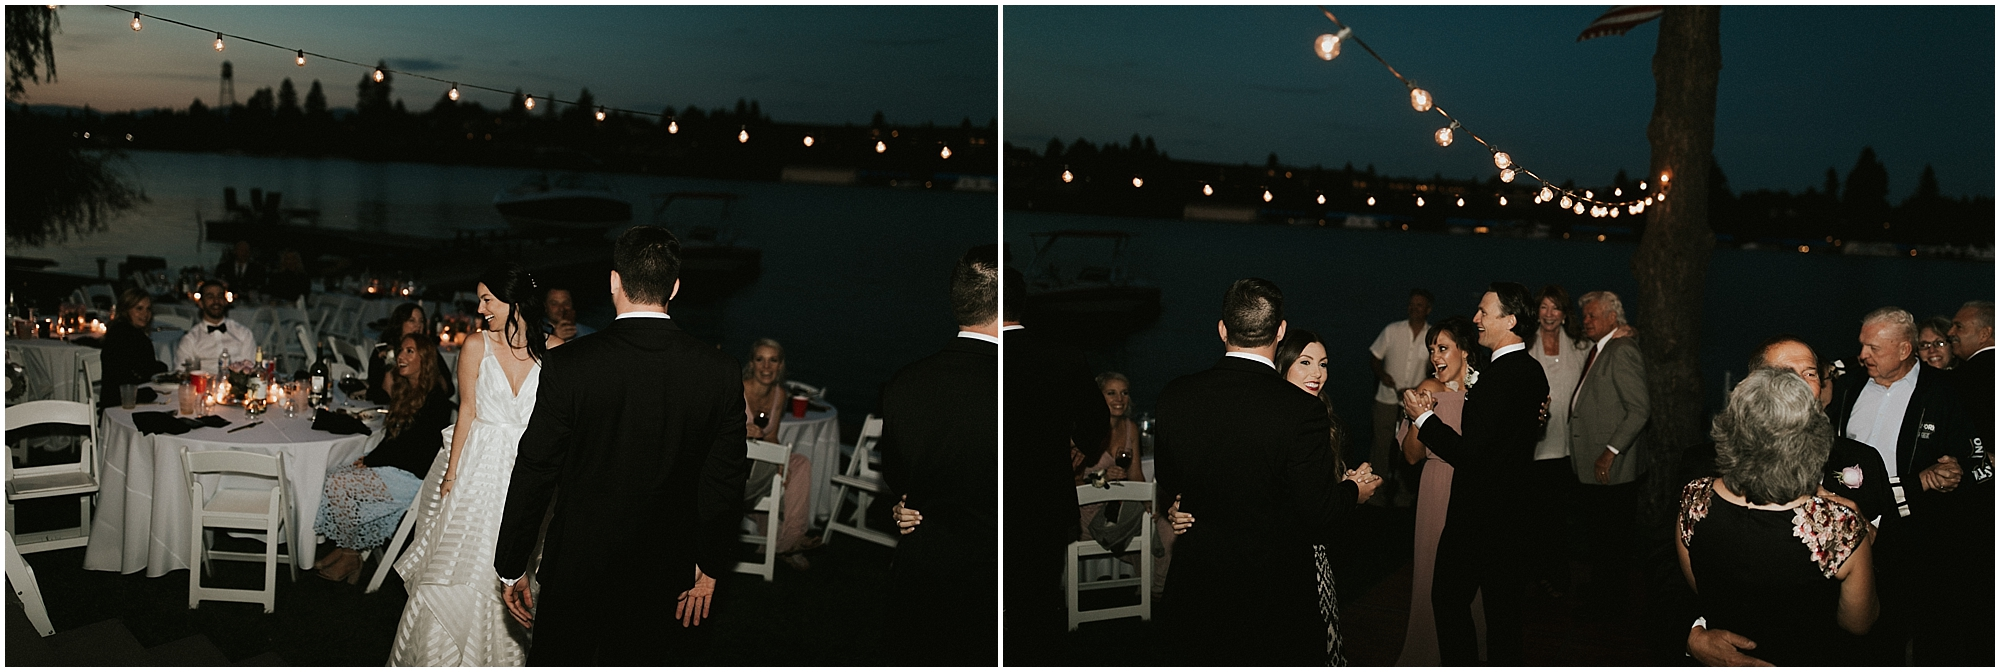 Idaho Lake Wedding Cassie Trottier Photography1124.jpg